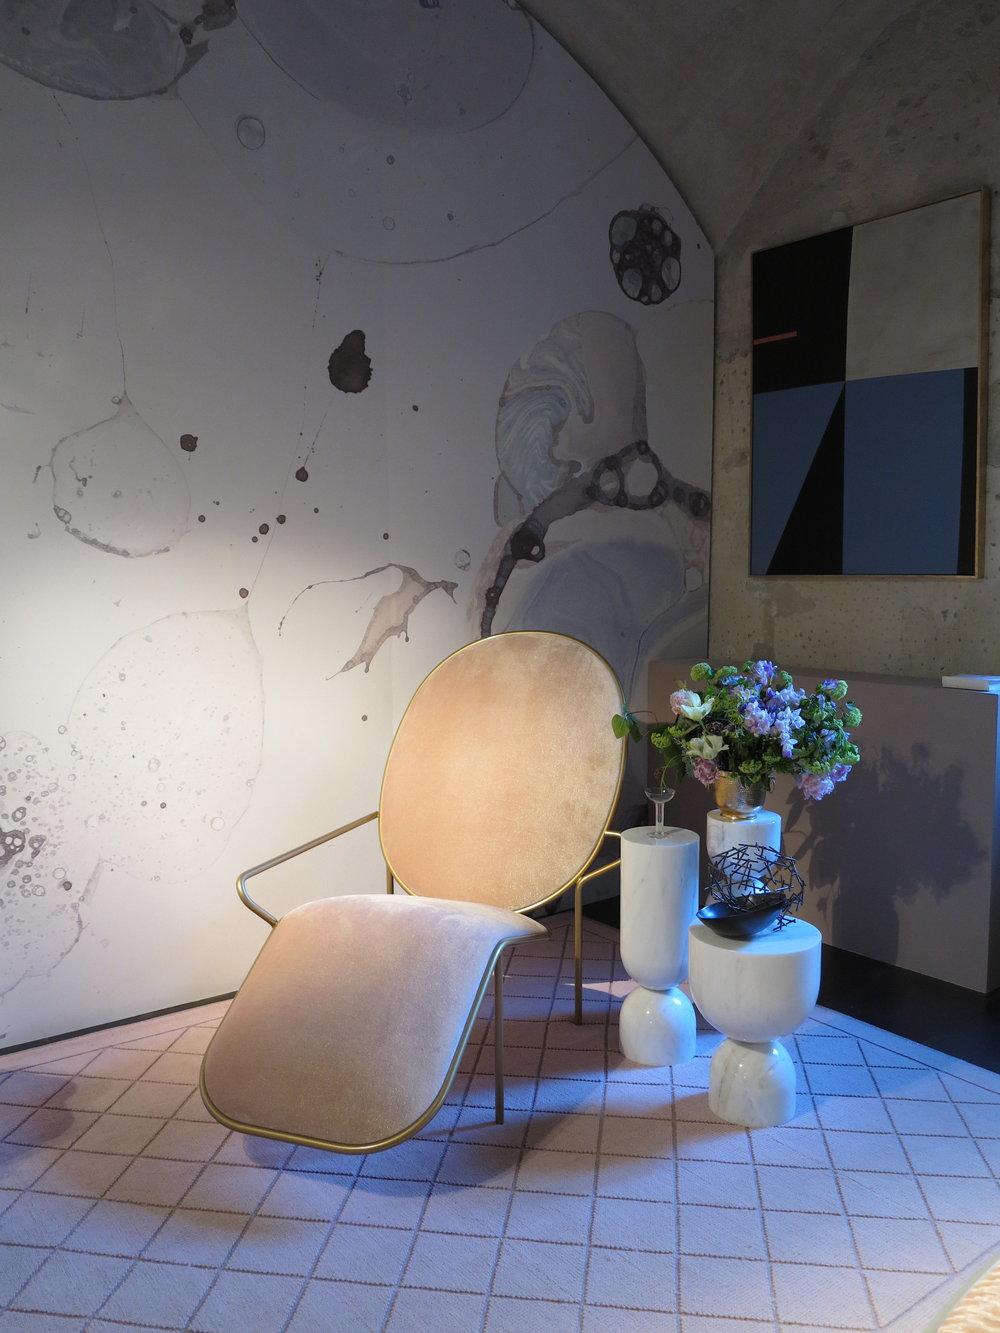 Sè  installation at Rossana Orlandi